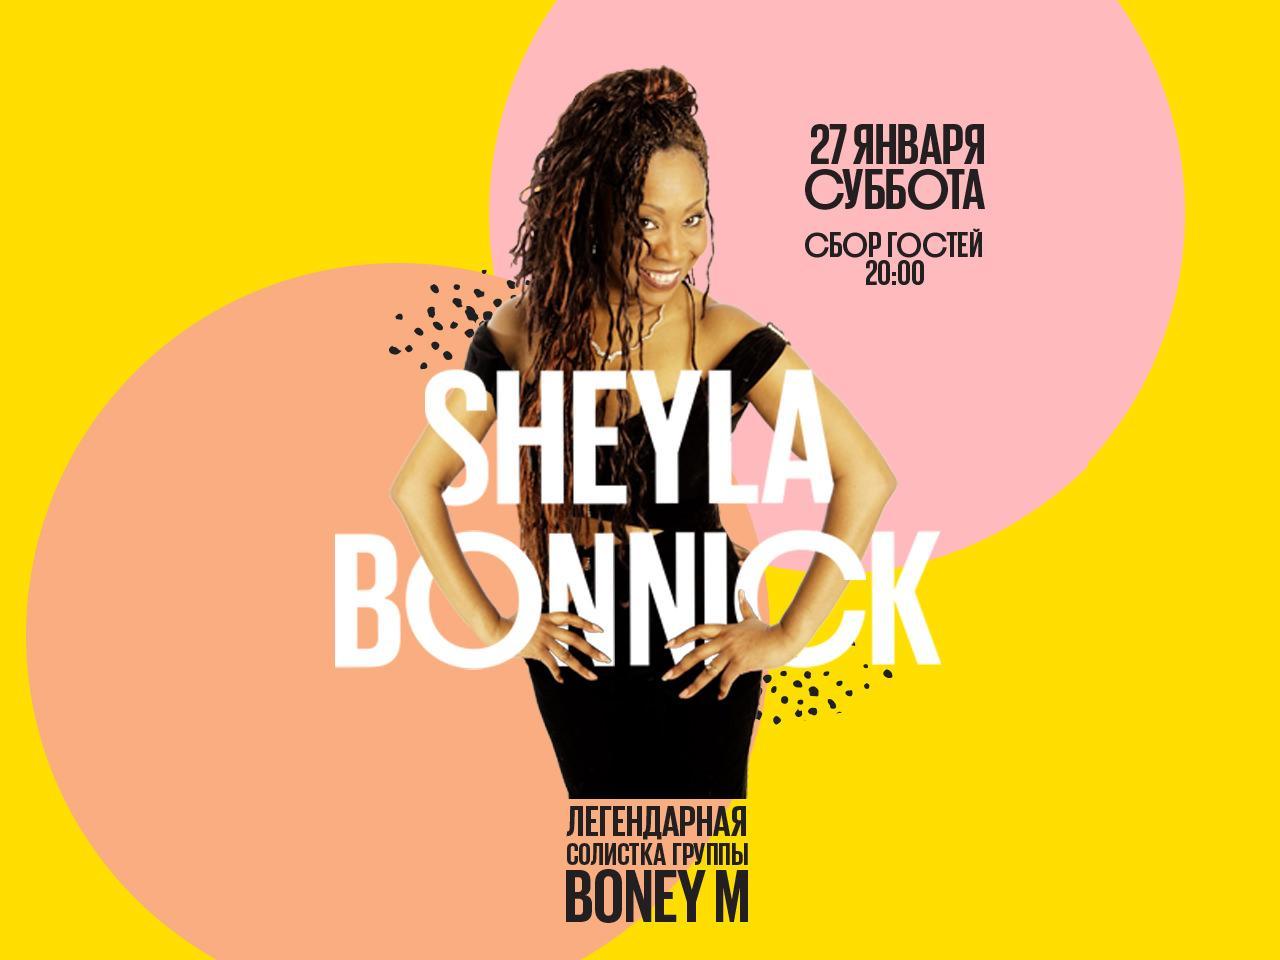 Sheila Bonnick